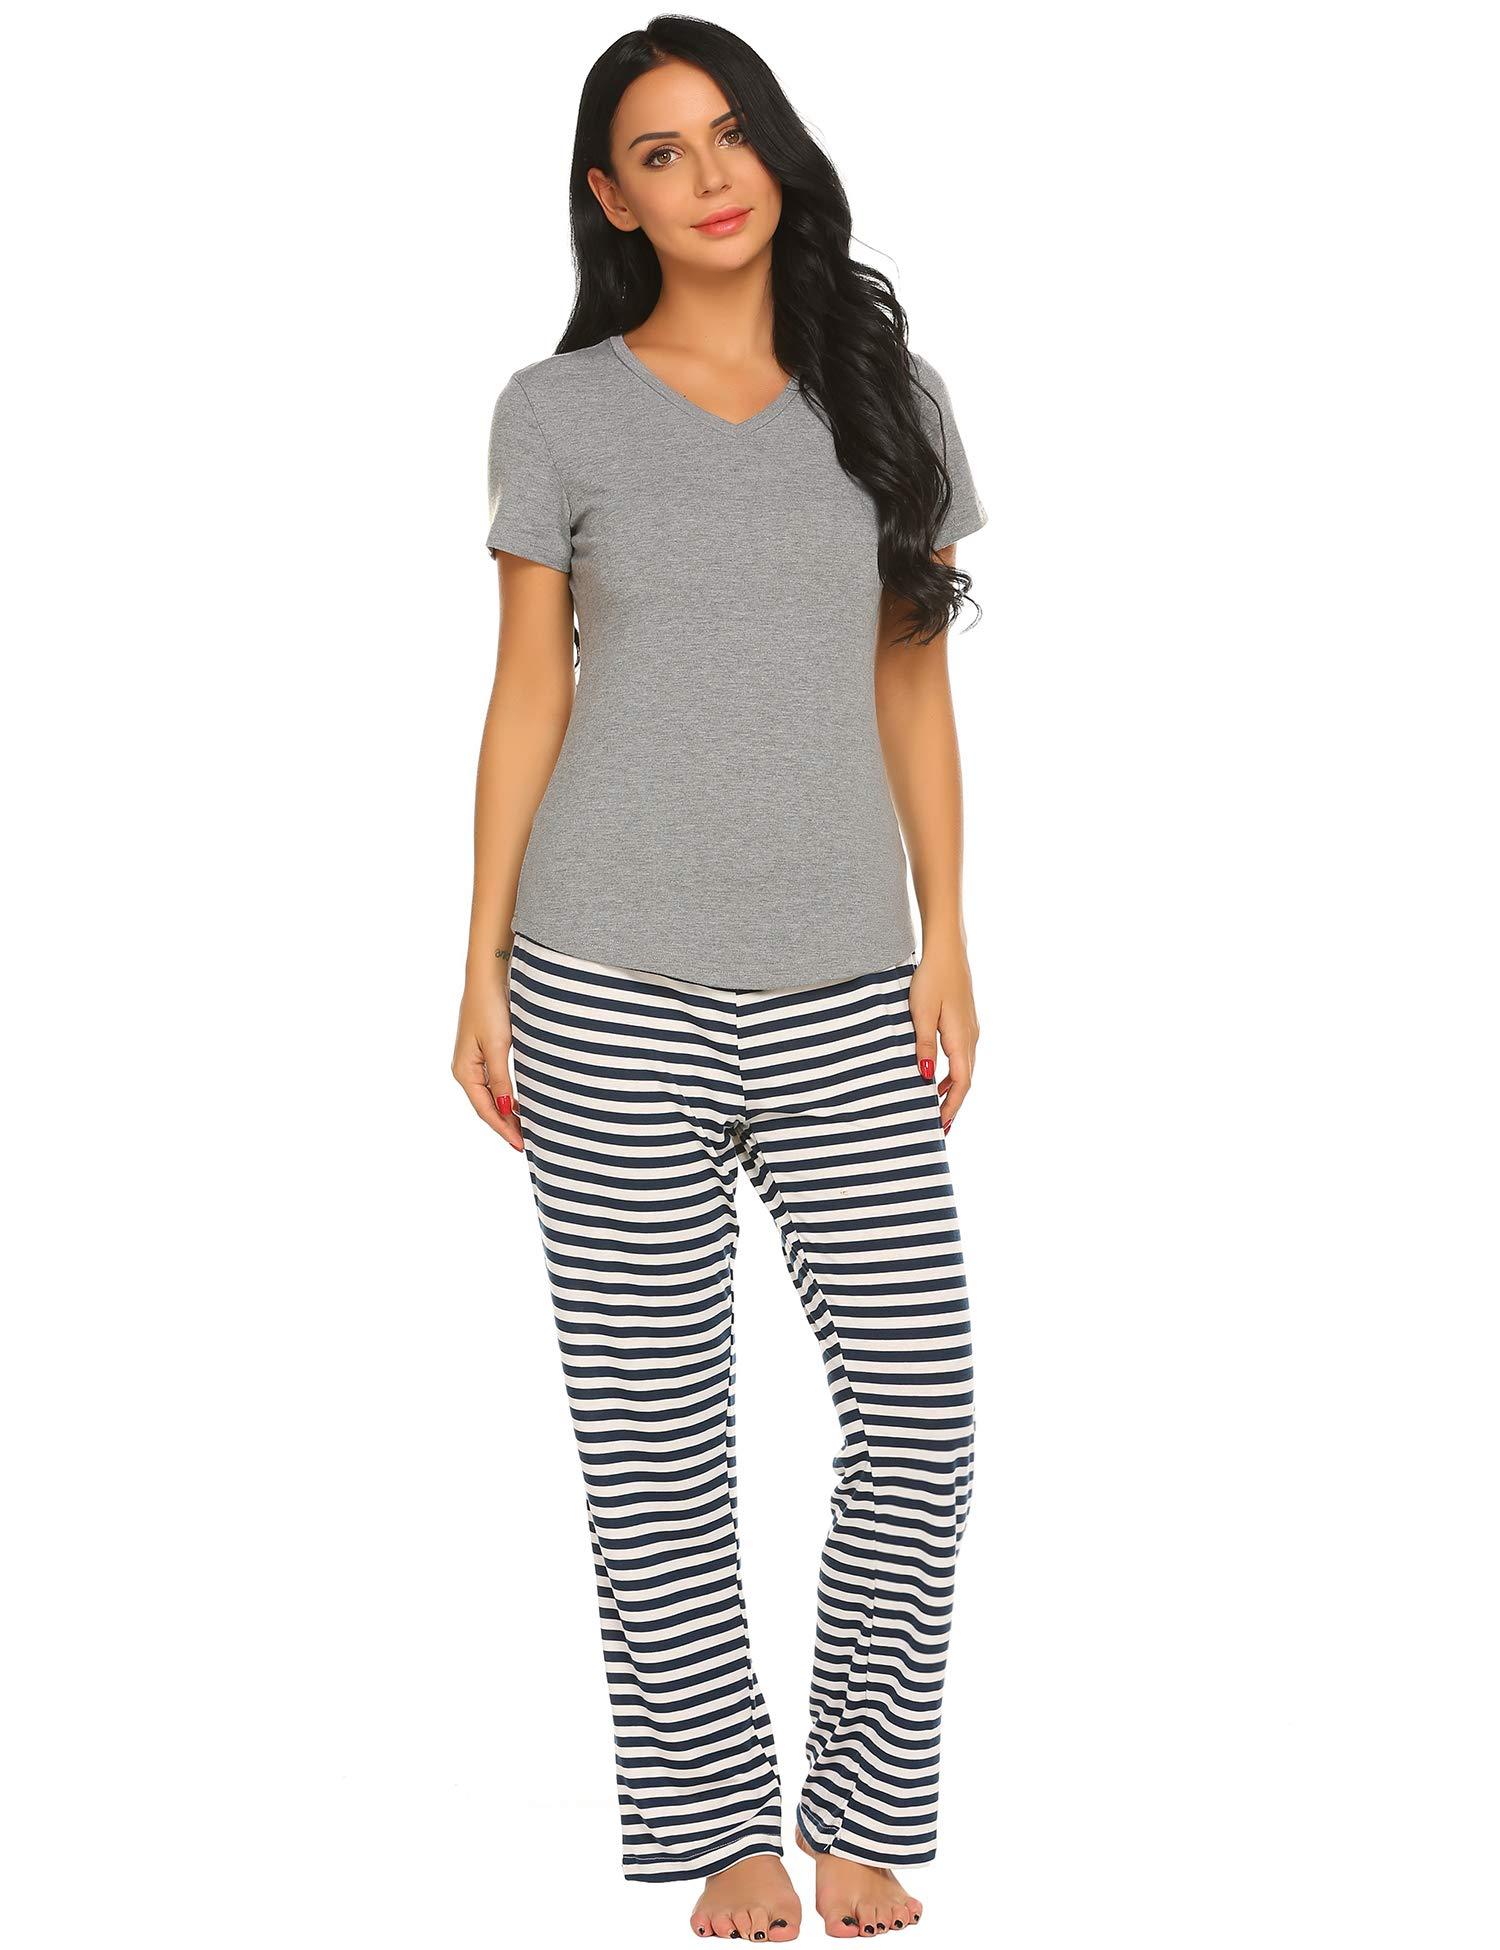 Ekouaer Women's Pajama Set Short Sleeve T Shirt with Capris Pants Print Loungewear Sets S-XXL